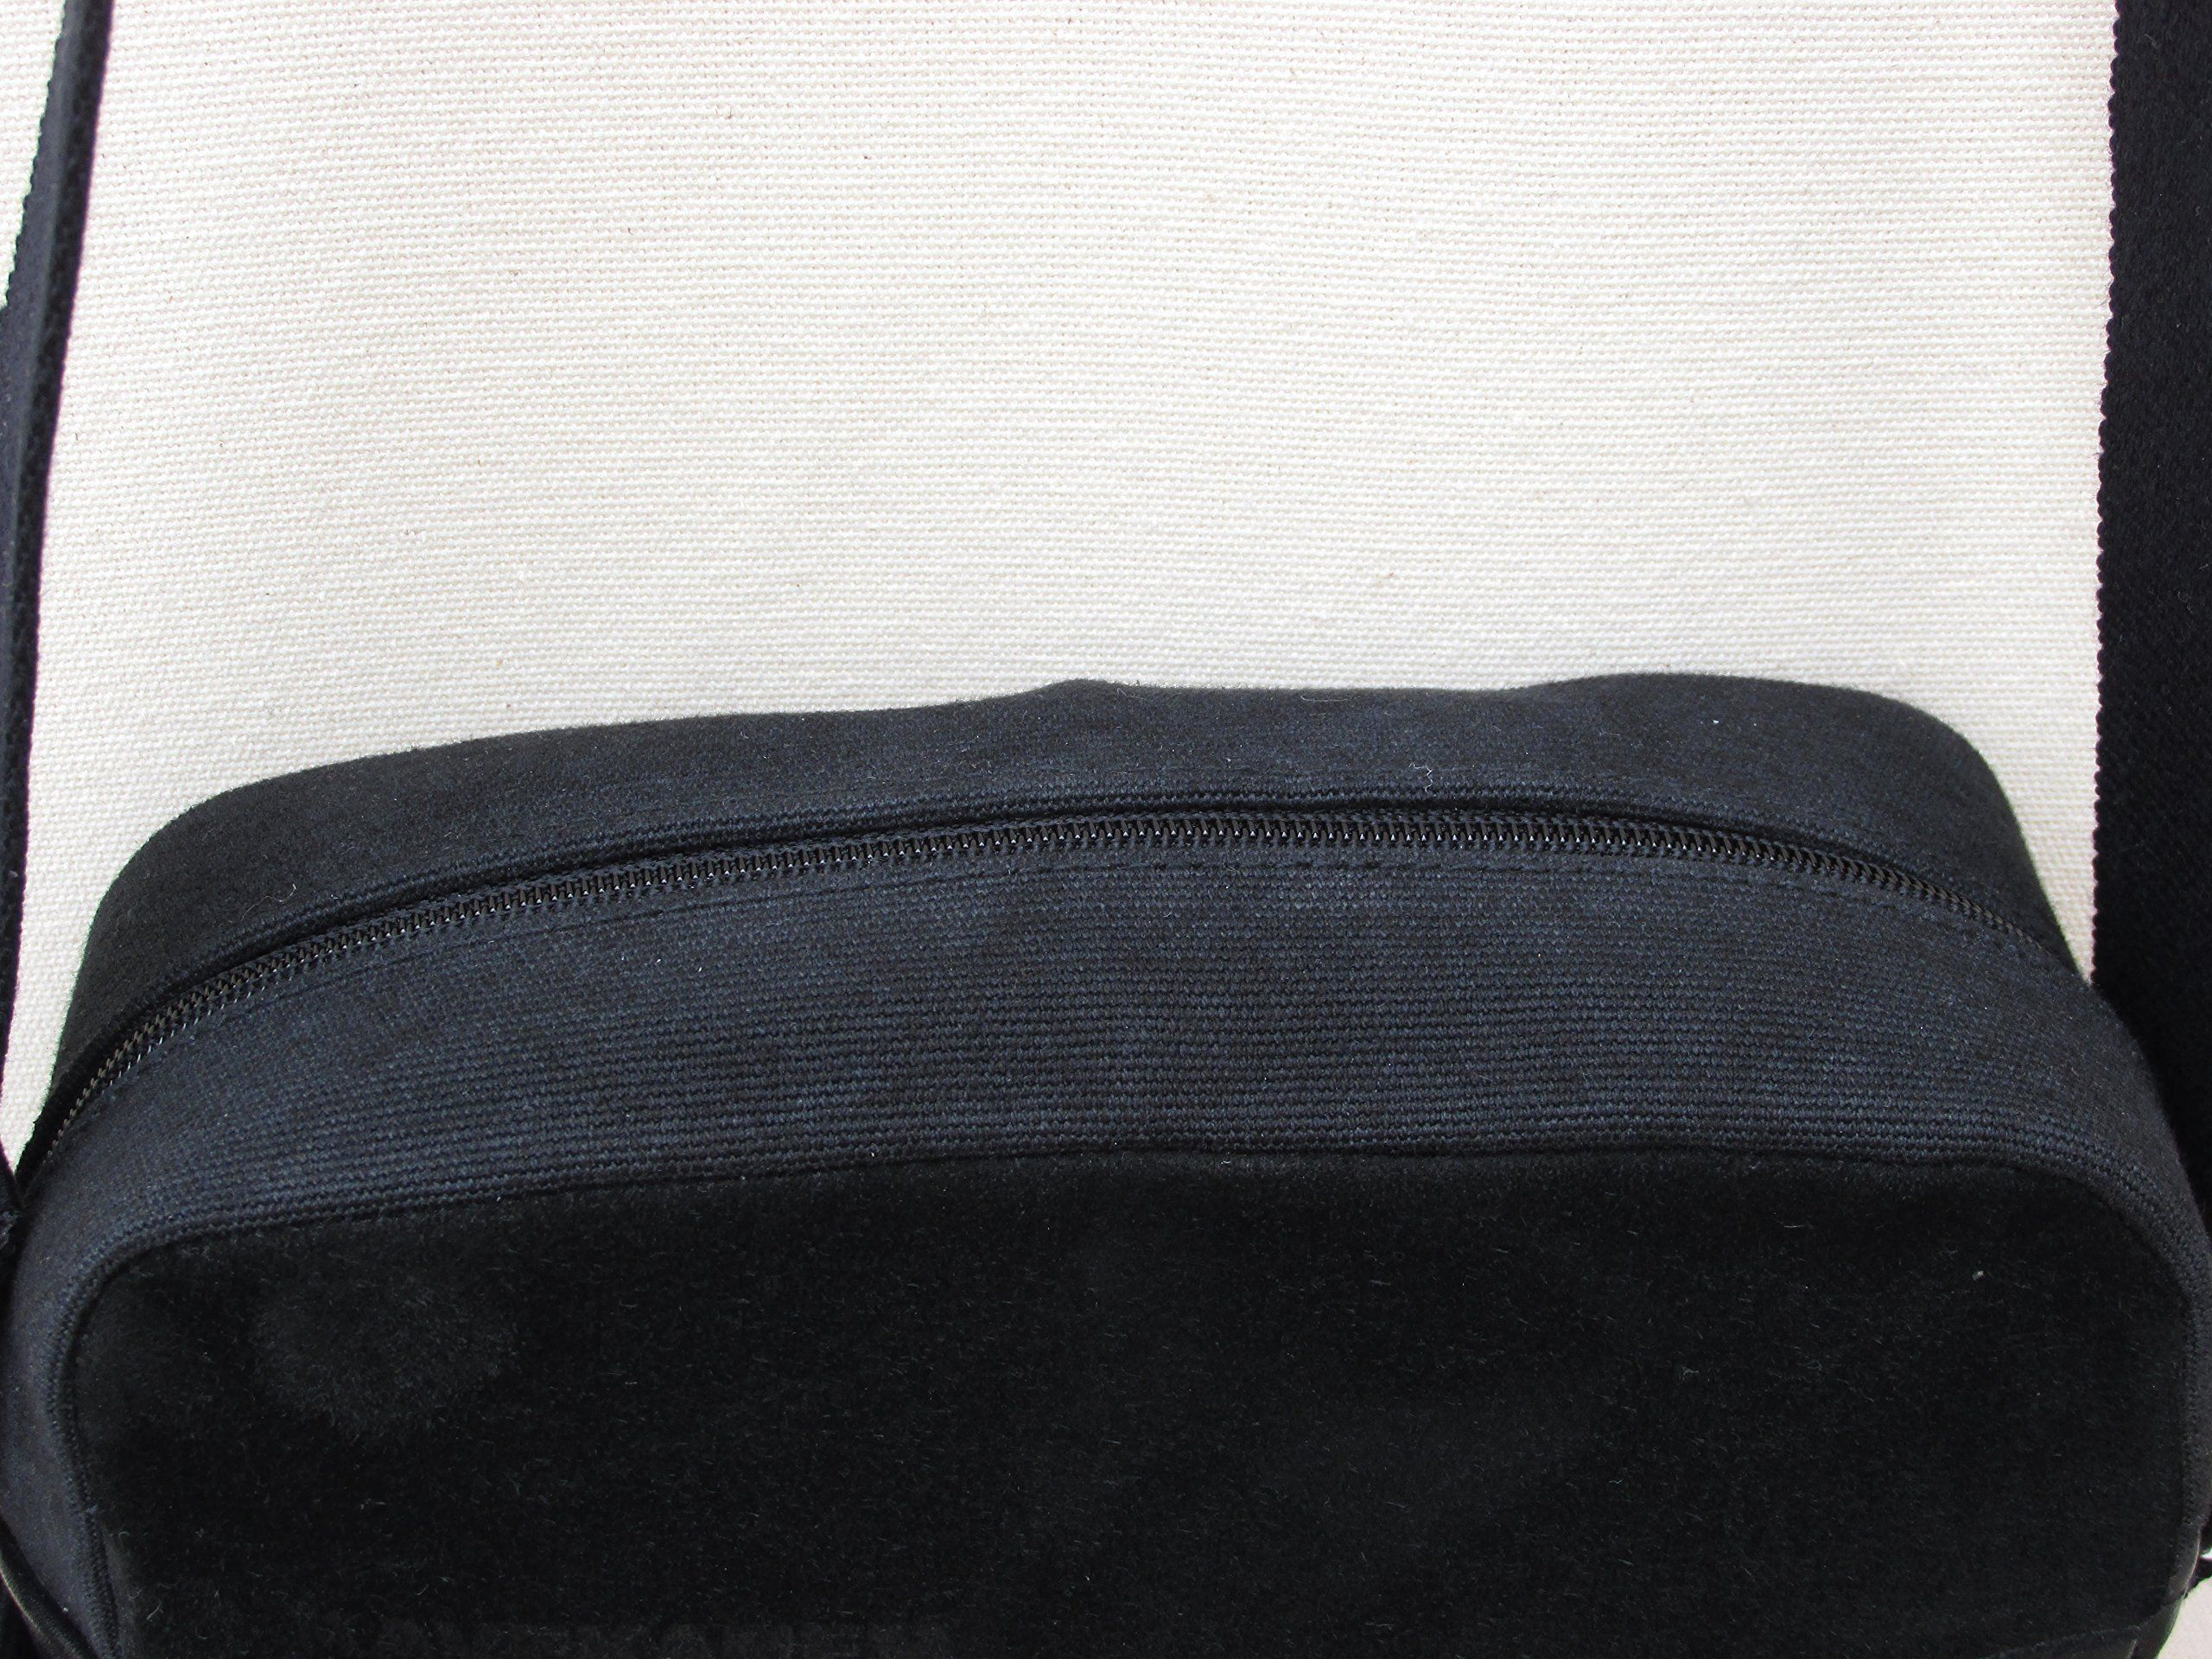 Nero caso in pelle custodia per iPhone XS X cover case #pelle